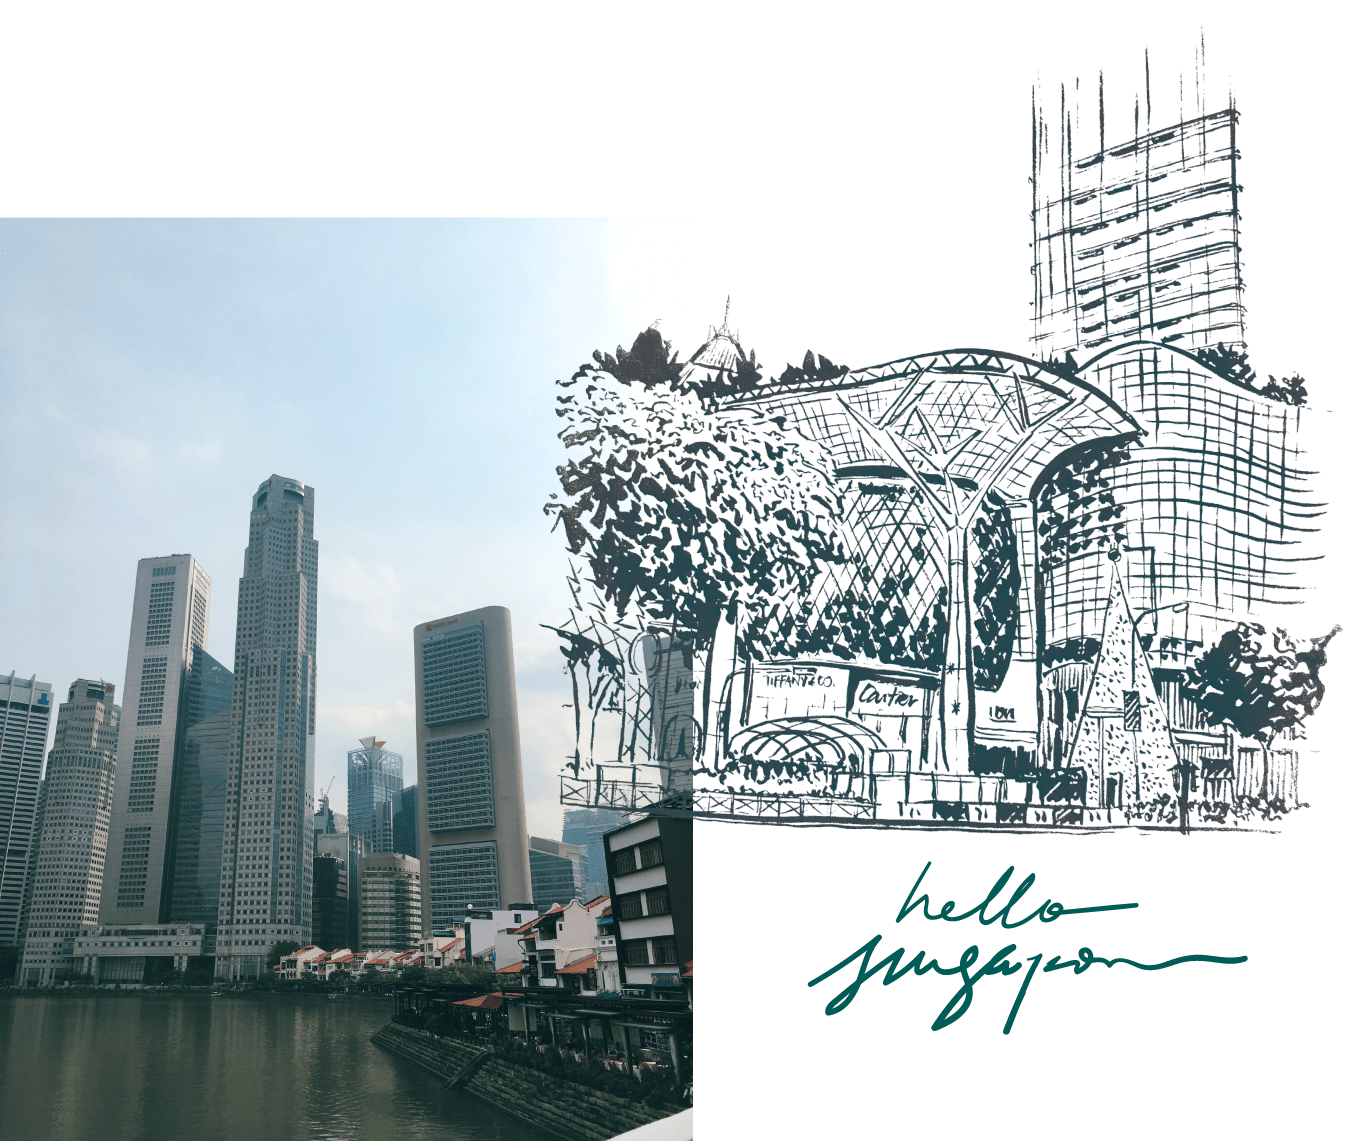 20180201_HellofromSingapore_01a.png